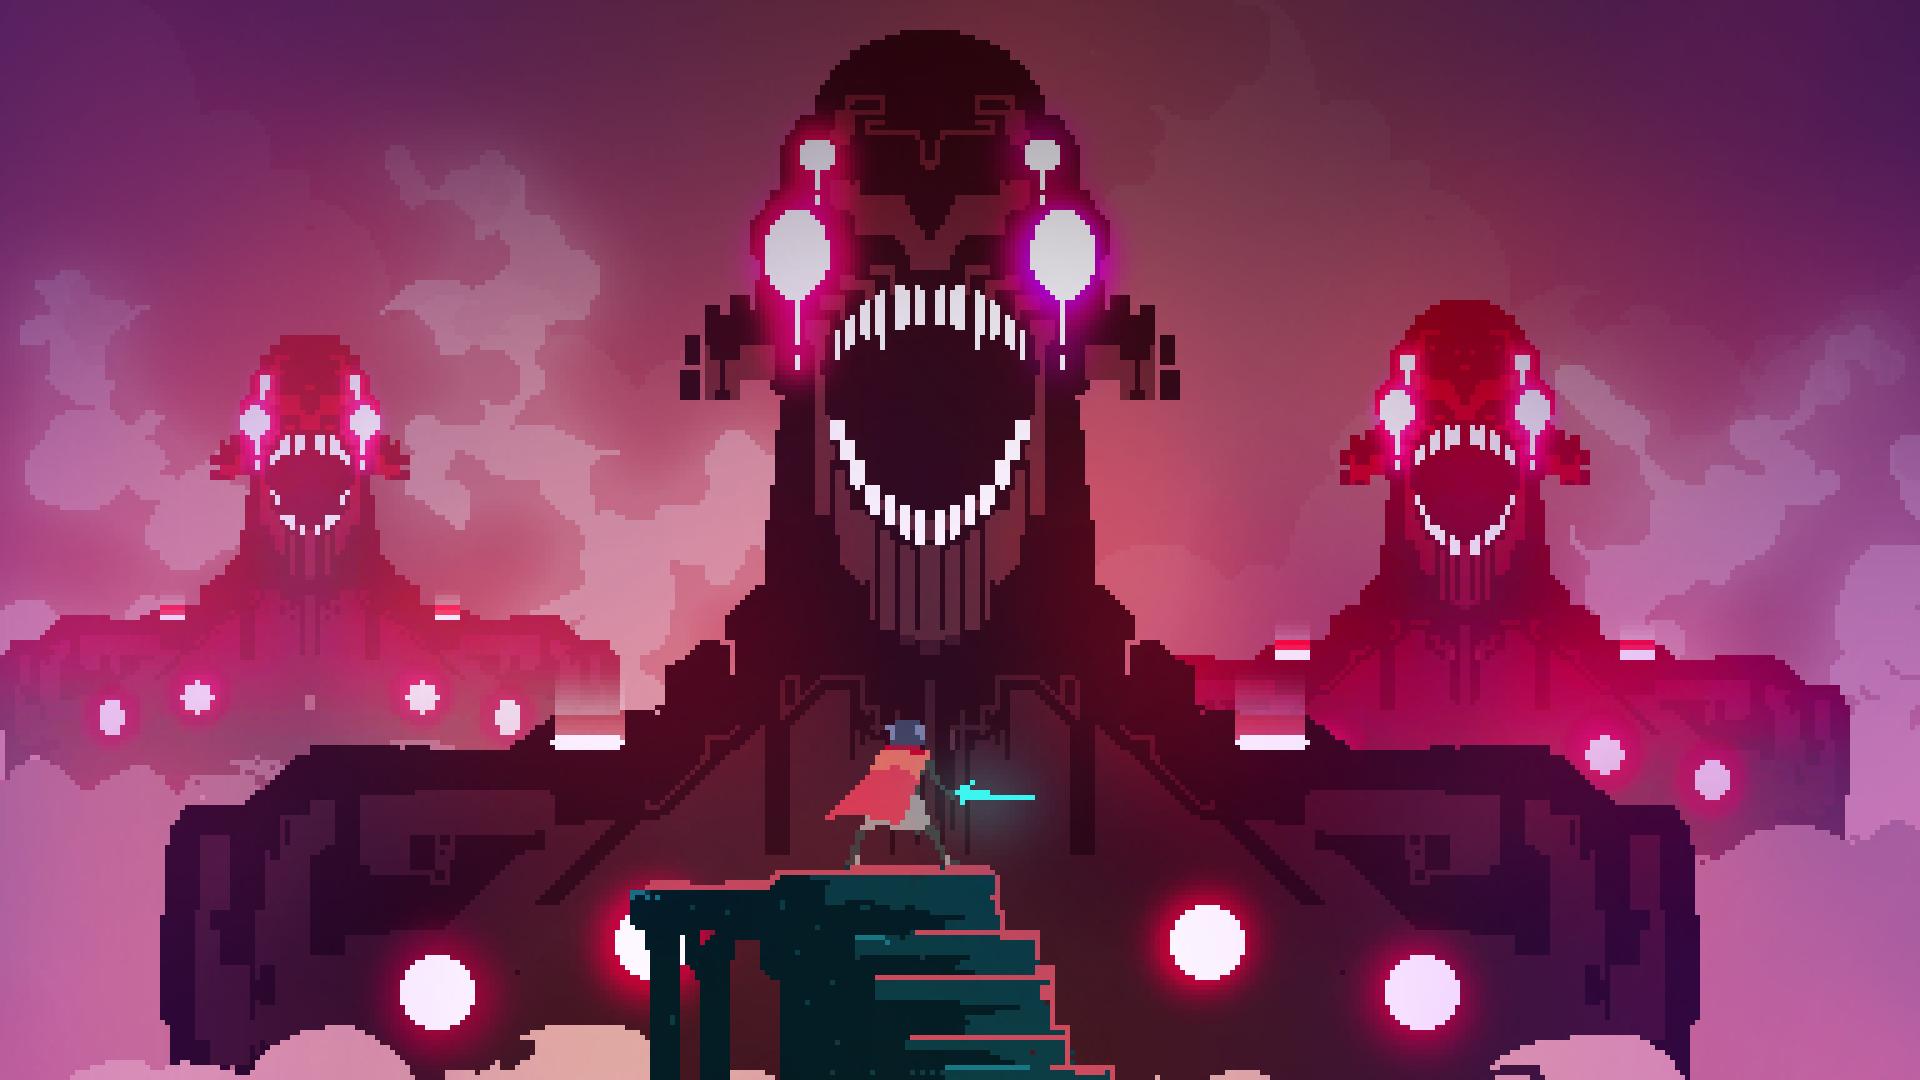 Wallpaper Illustration Video Games Anime Pixel Art Creature